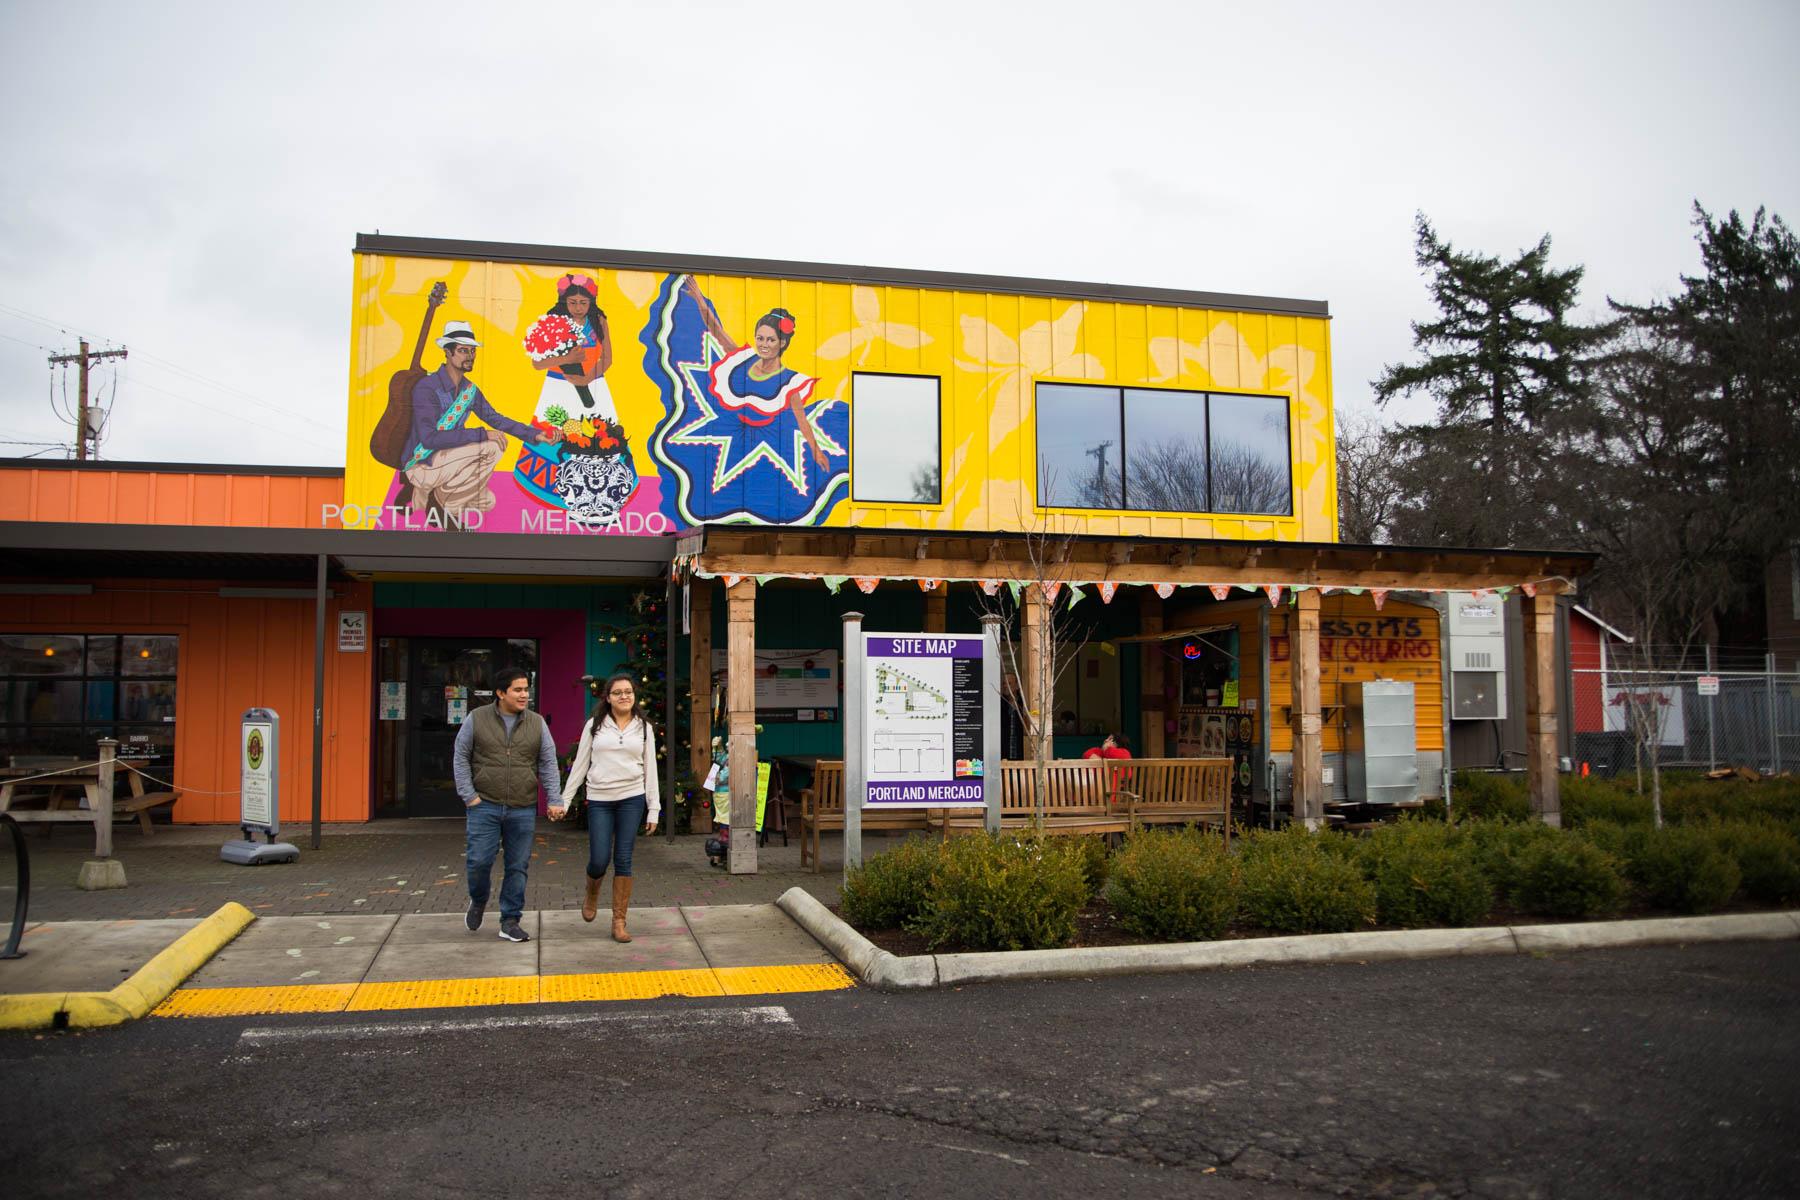 Portland Mercado11.jpg